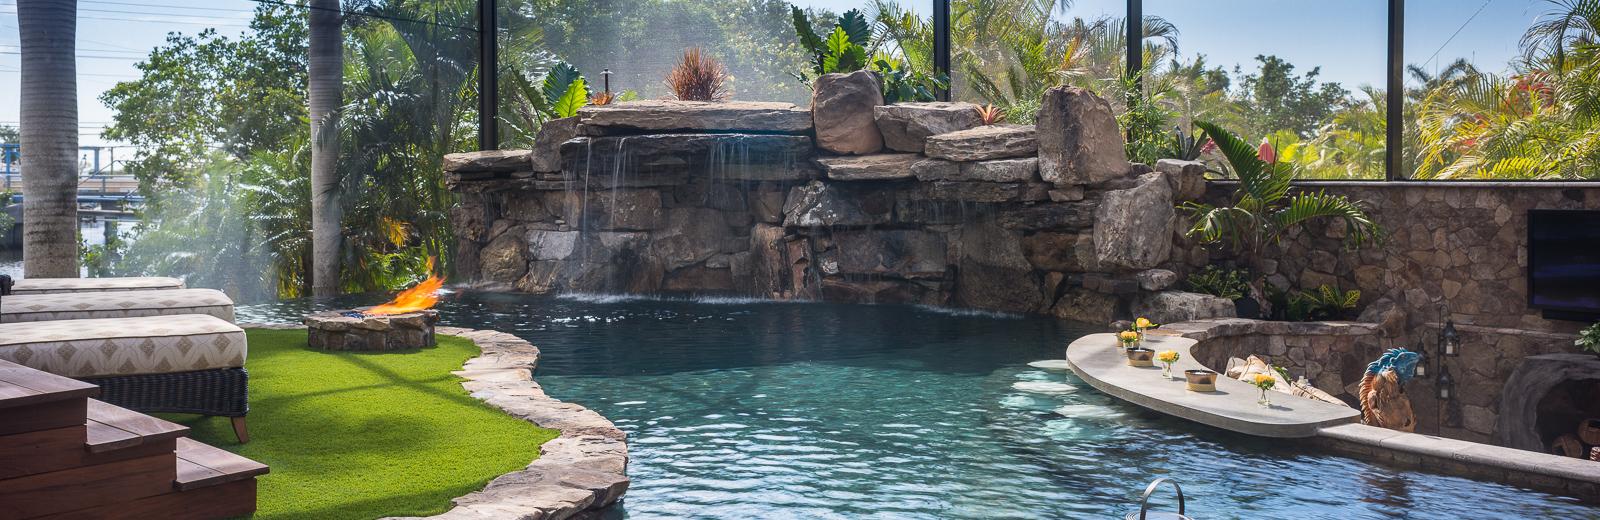 A lazy river runs through it custom pool on pine island for Swimming pool trade show florida